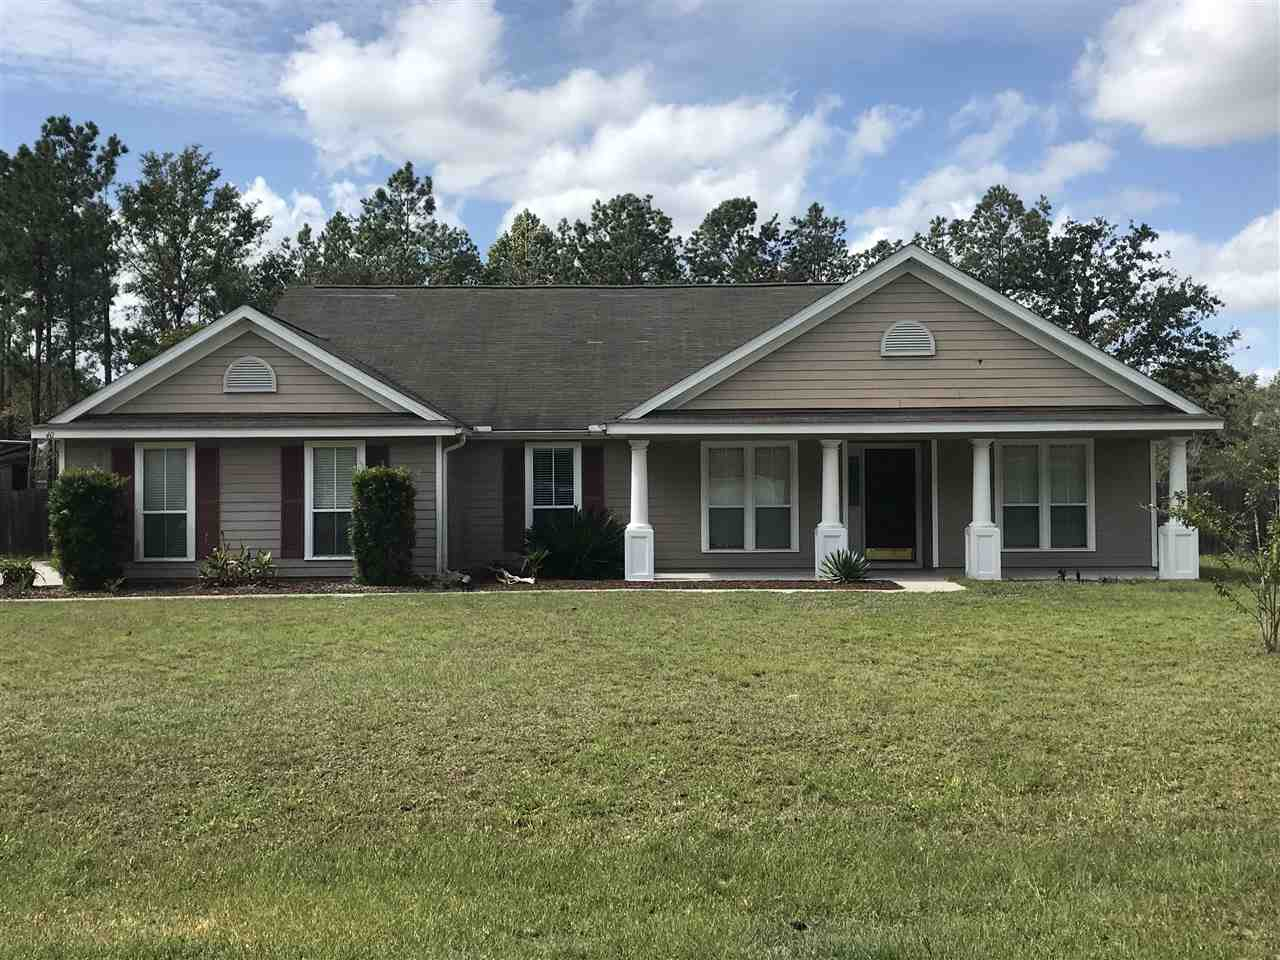 Property ID 286310